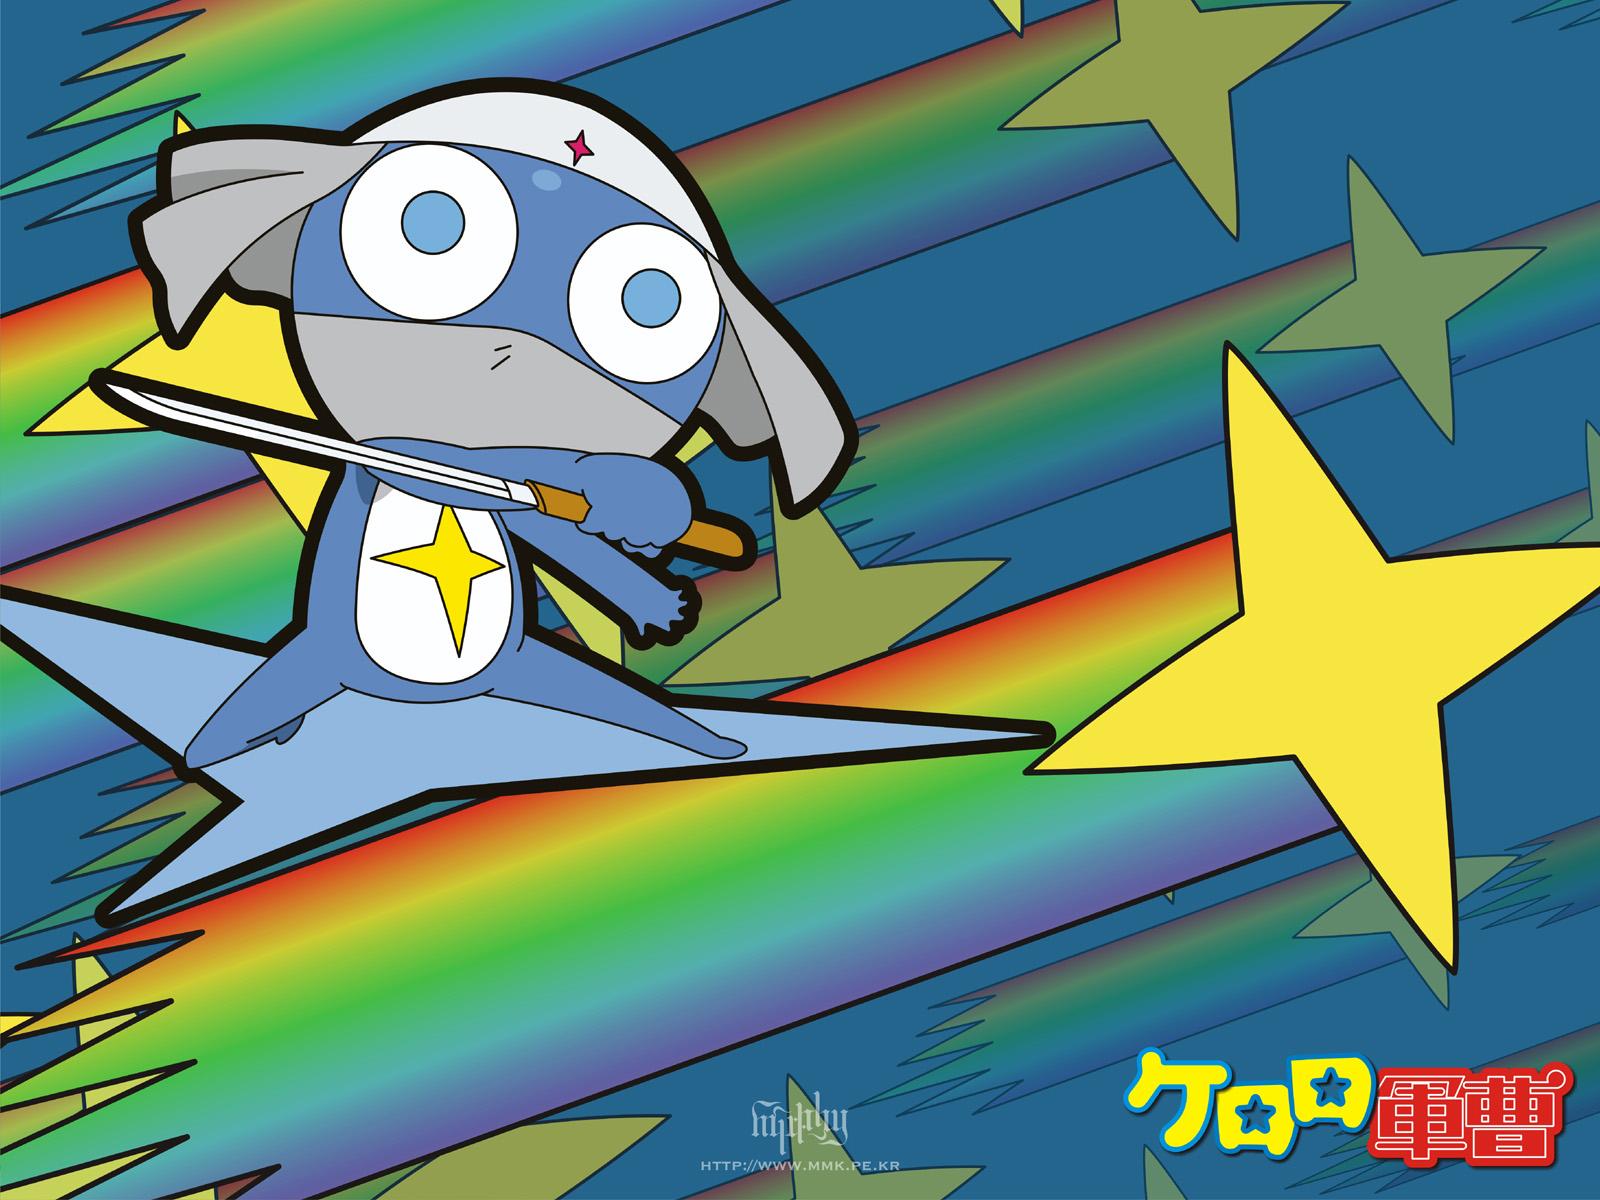 La mascota más mona de anime Muphy_wallpaper_dororo_v1_n43_1600